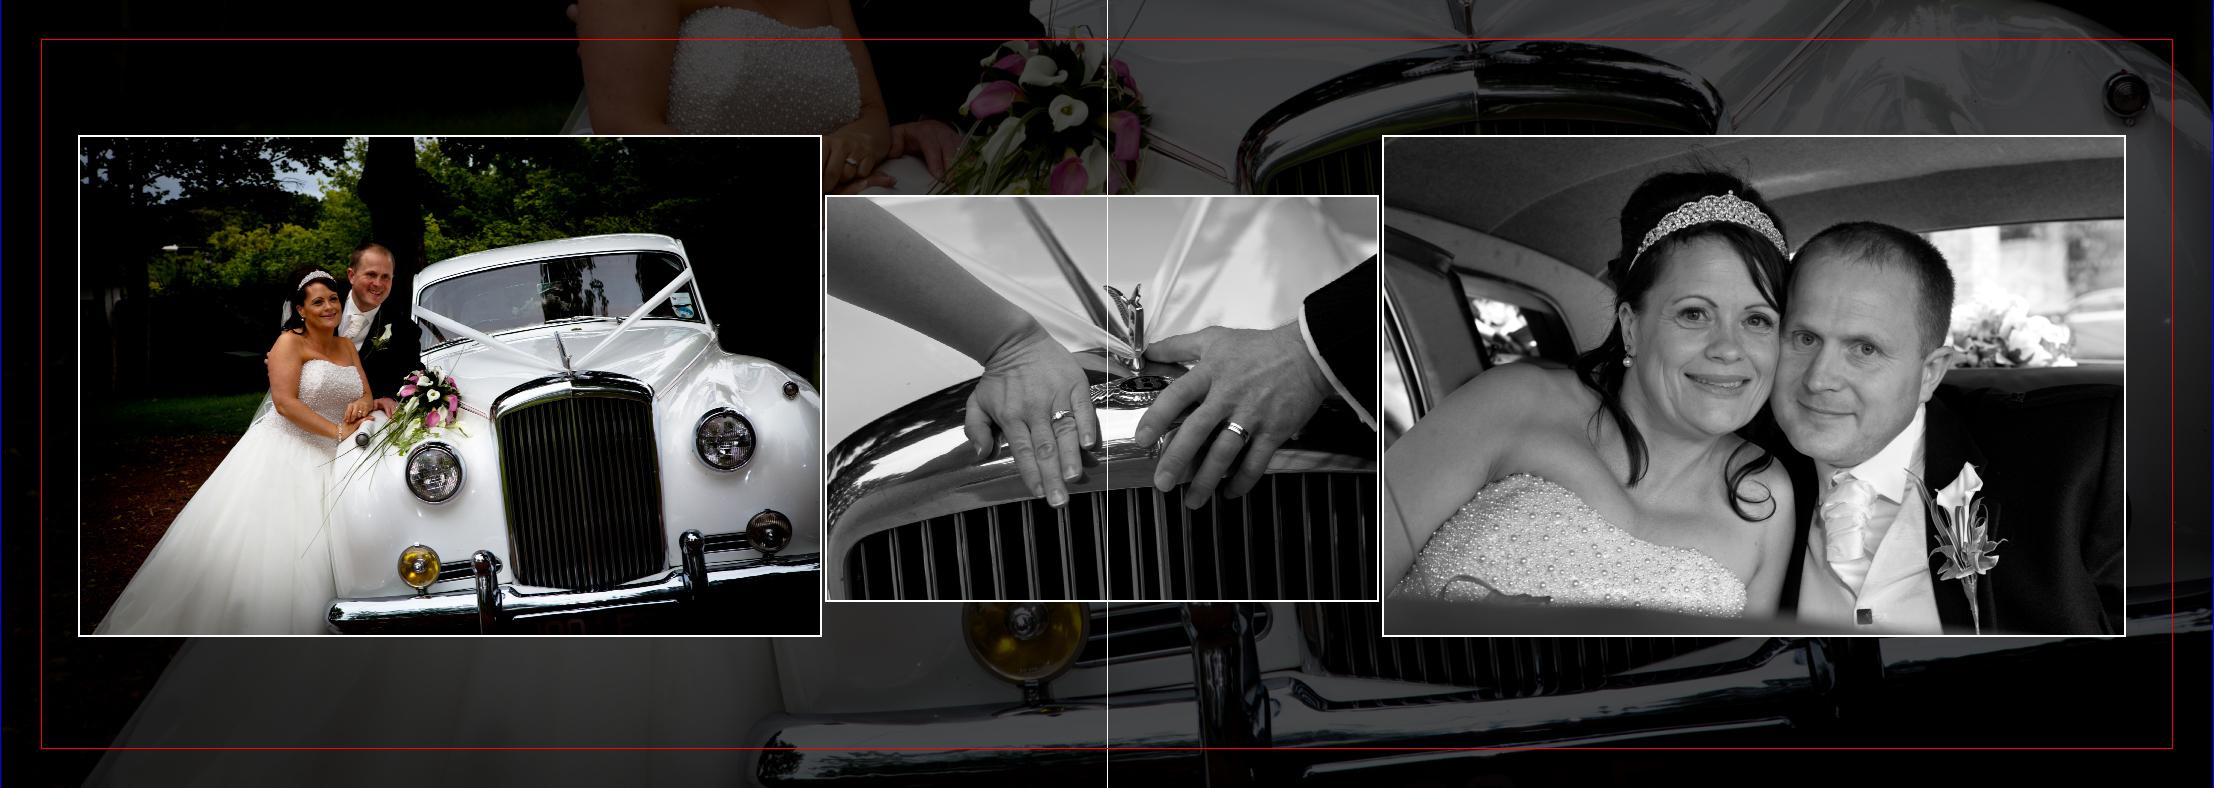 Best Car Designs >> Bellissimo Story book samples | Gary Davidson Photography Blog, Wedding Photographers Glasgow